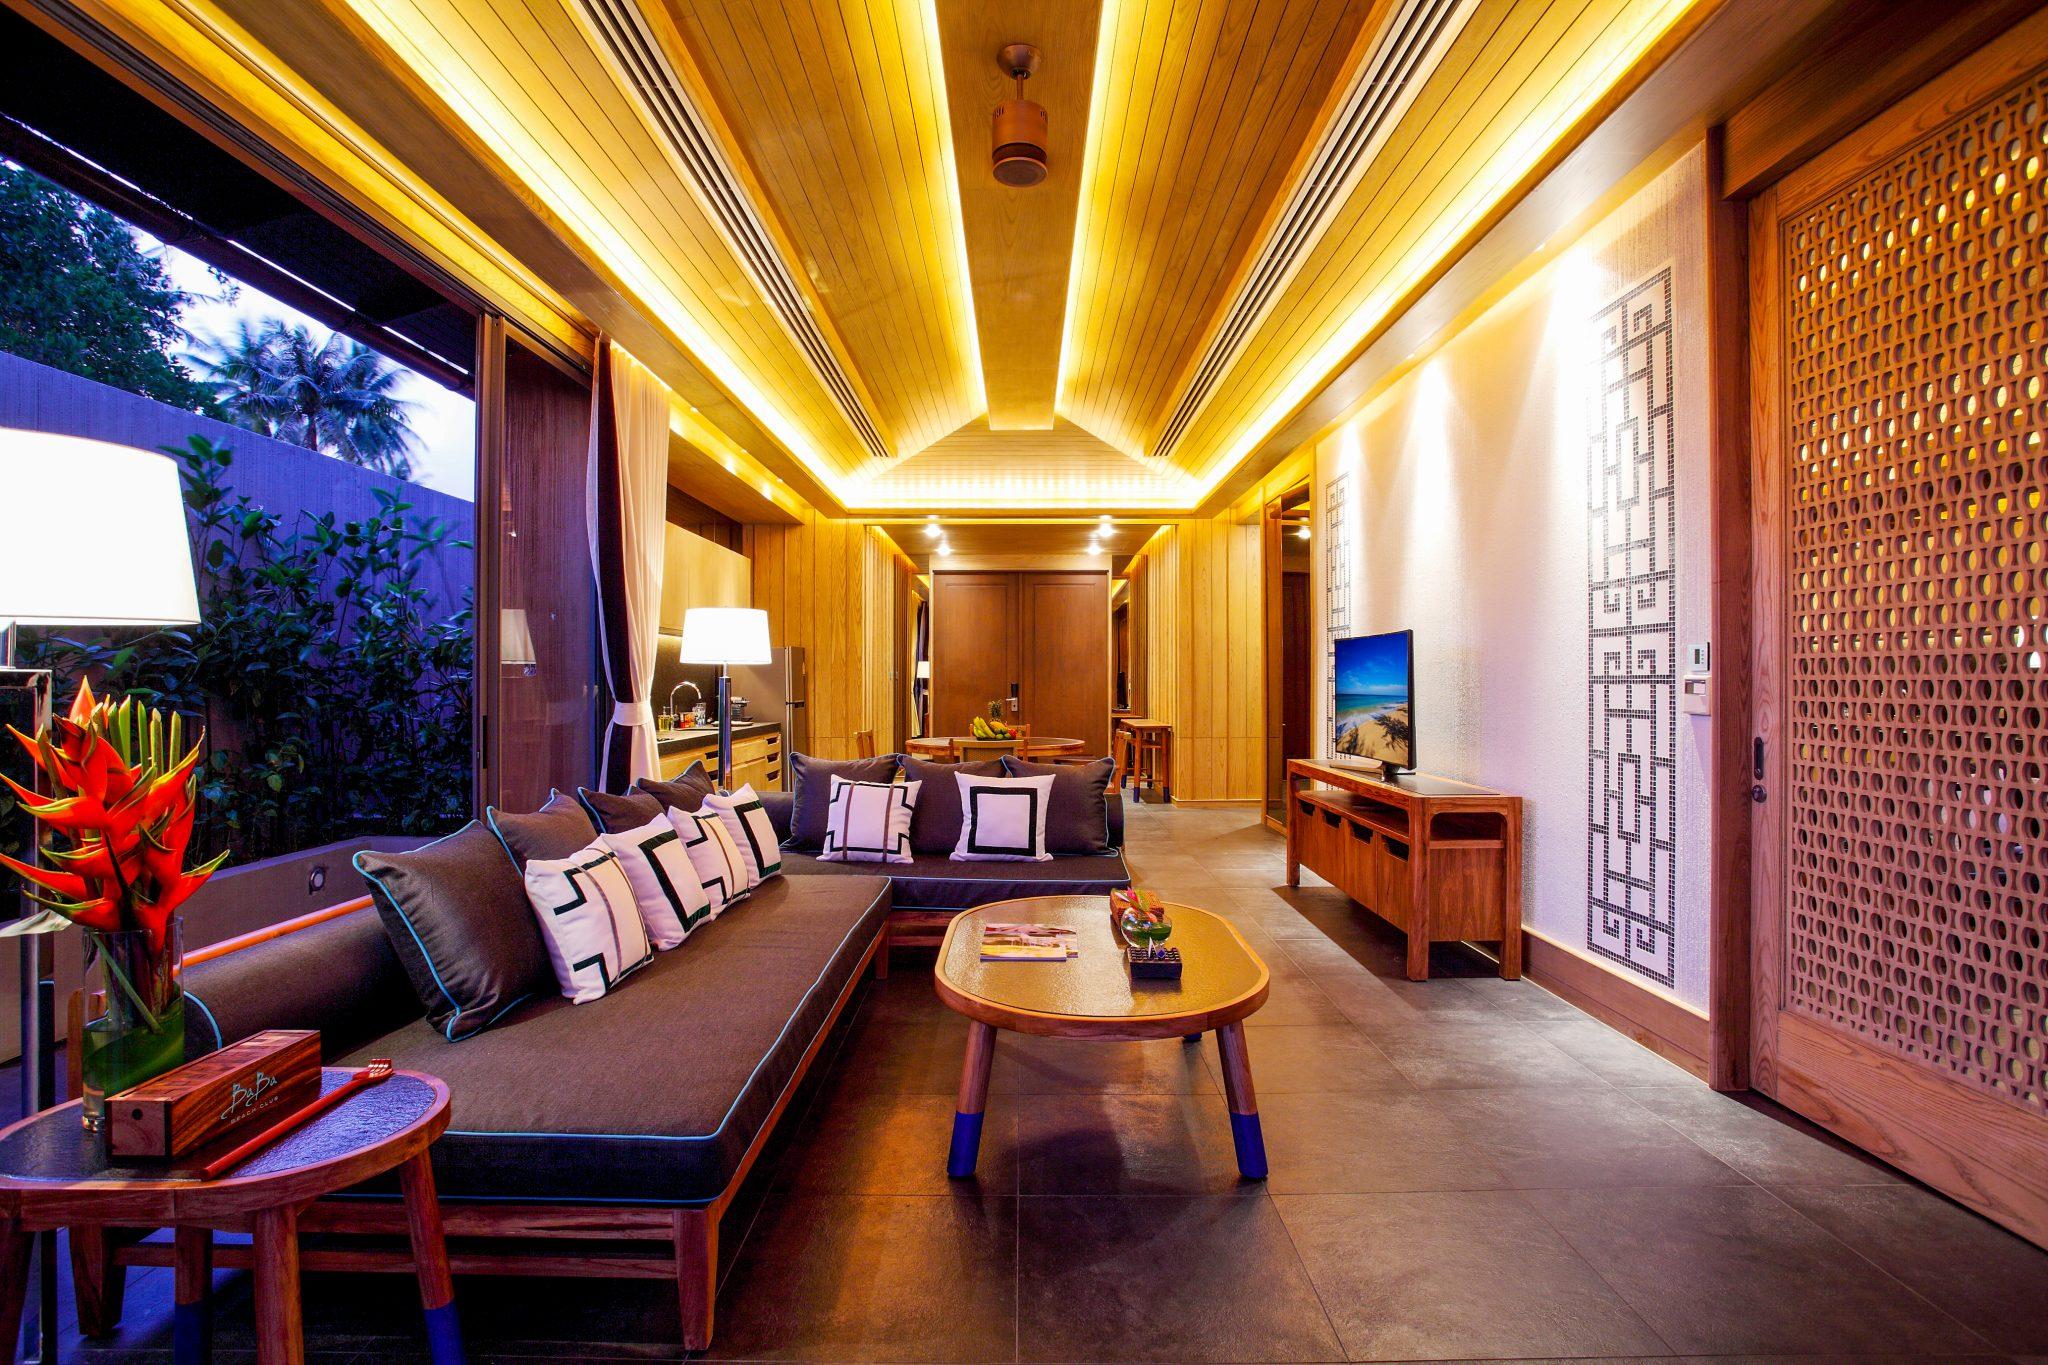 Phuket Real Estate Agency – Natai Beach (5)